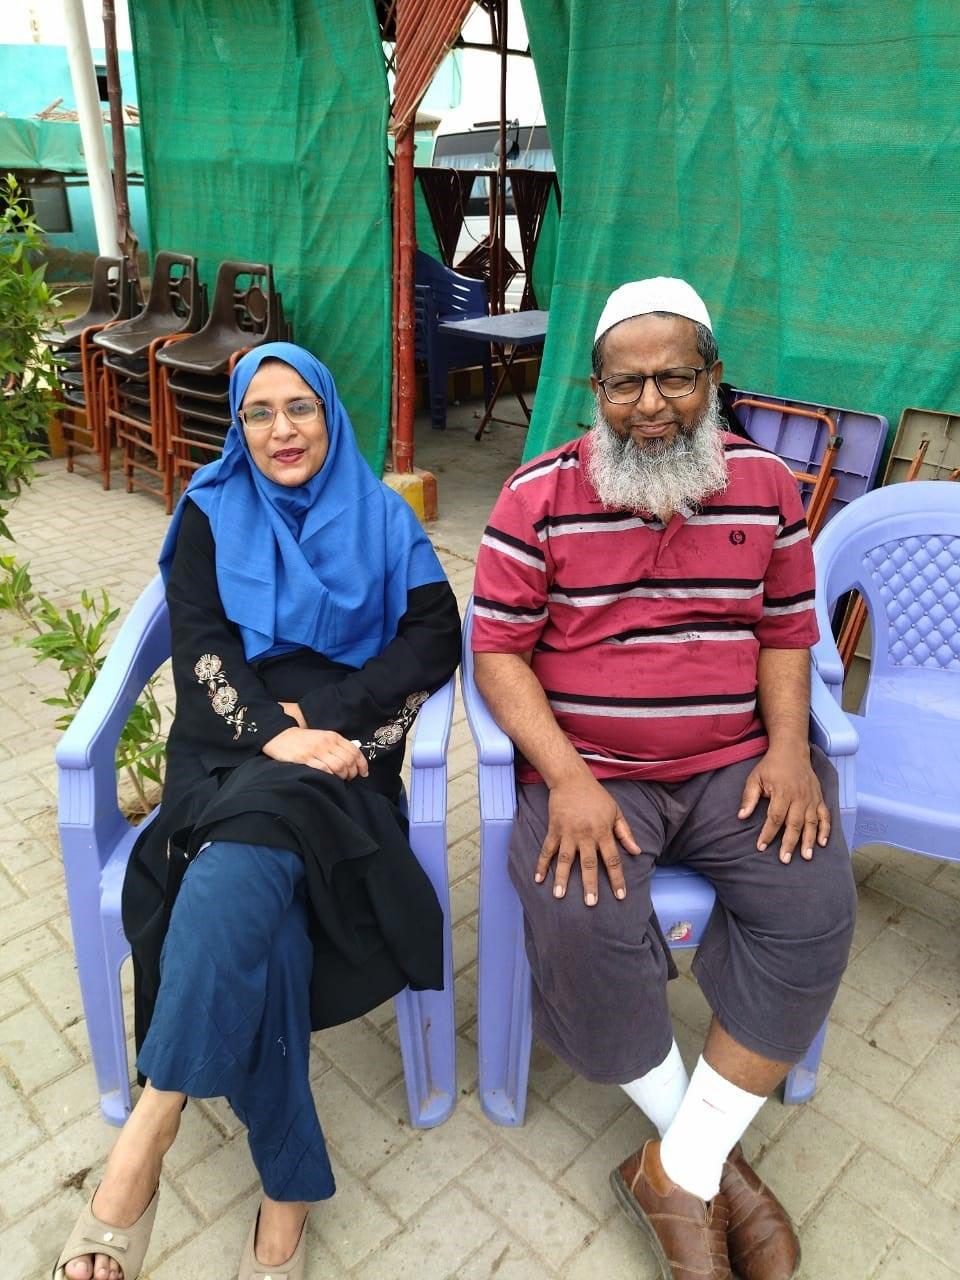 Mr. and Mrs. Abdul Bari at Winder Town Restaurant.